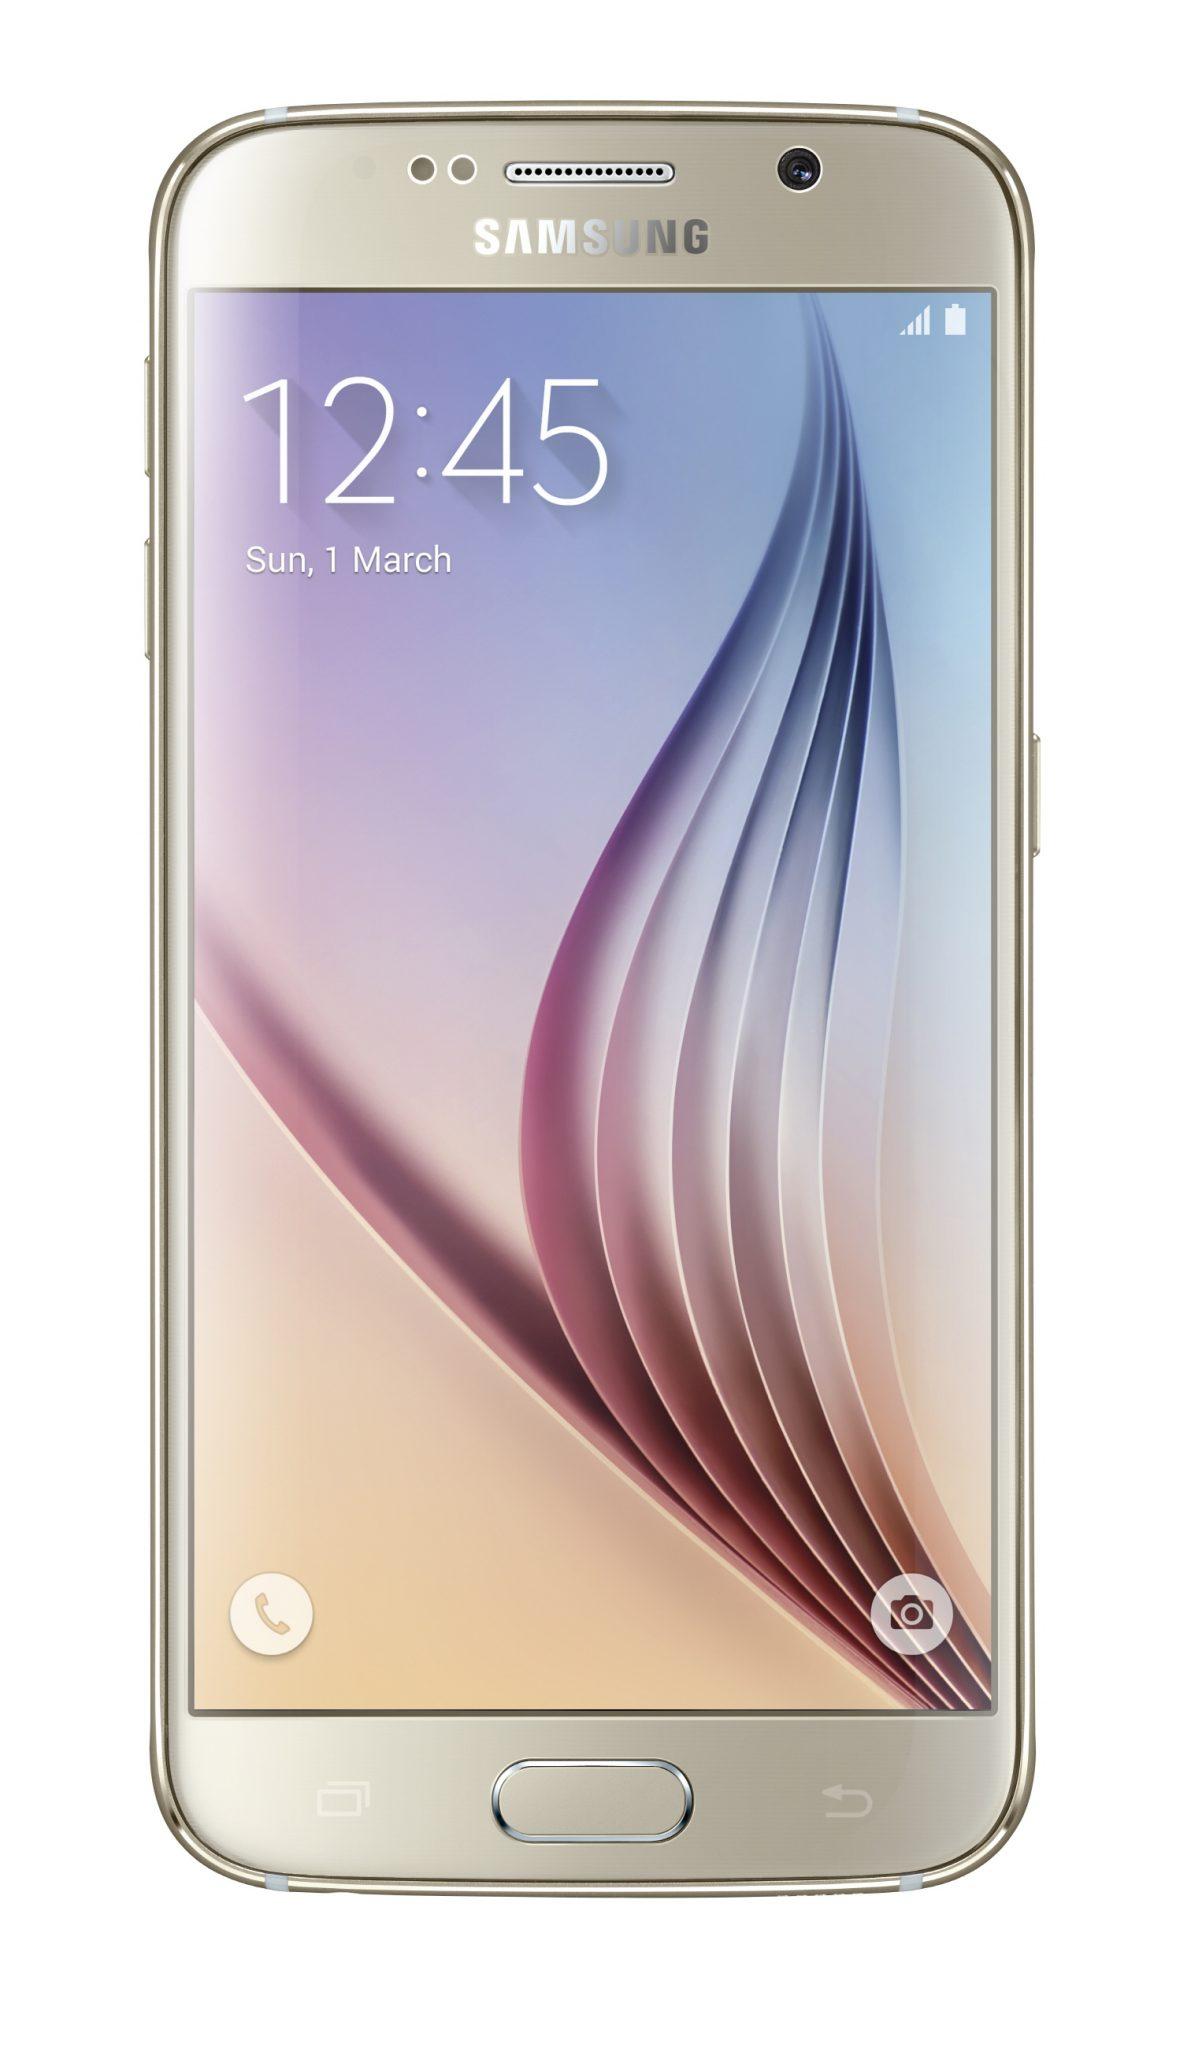 Samsung Galaxy S6 - Samsung presenta Galaxy S6 e Galaxy S6 edge